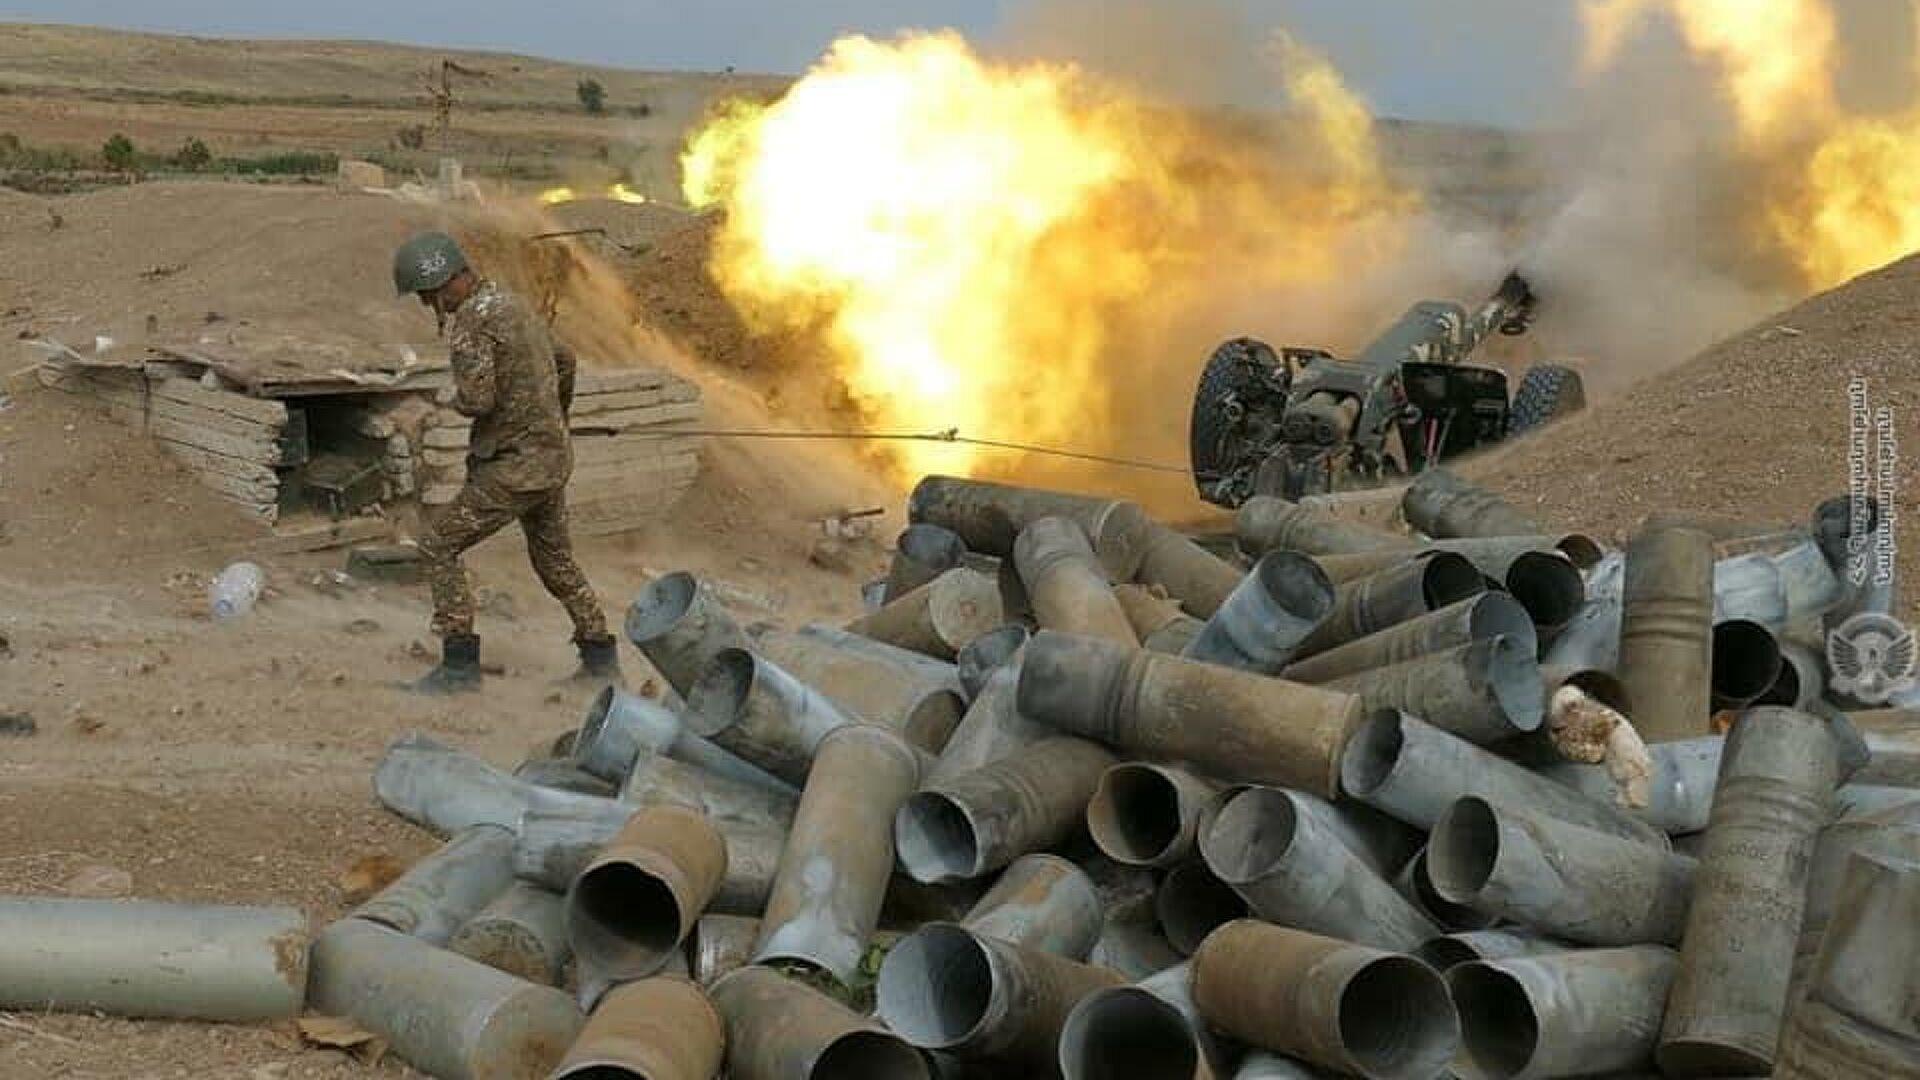 Азербайджан обвинил Армению в обстрелах